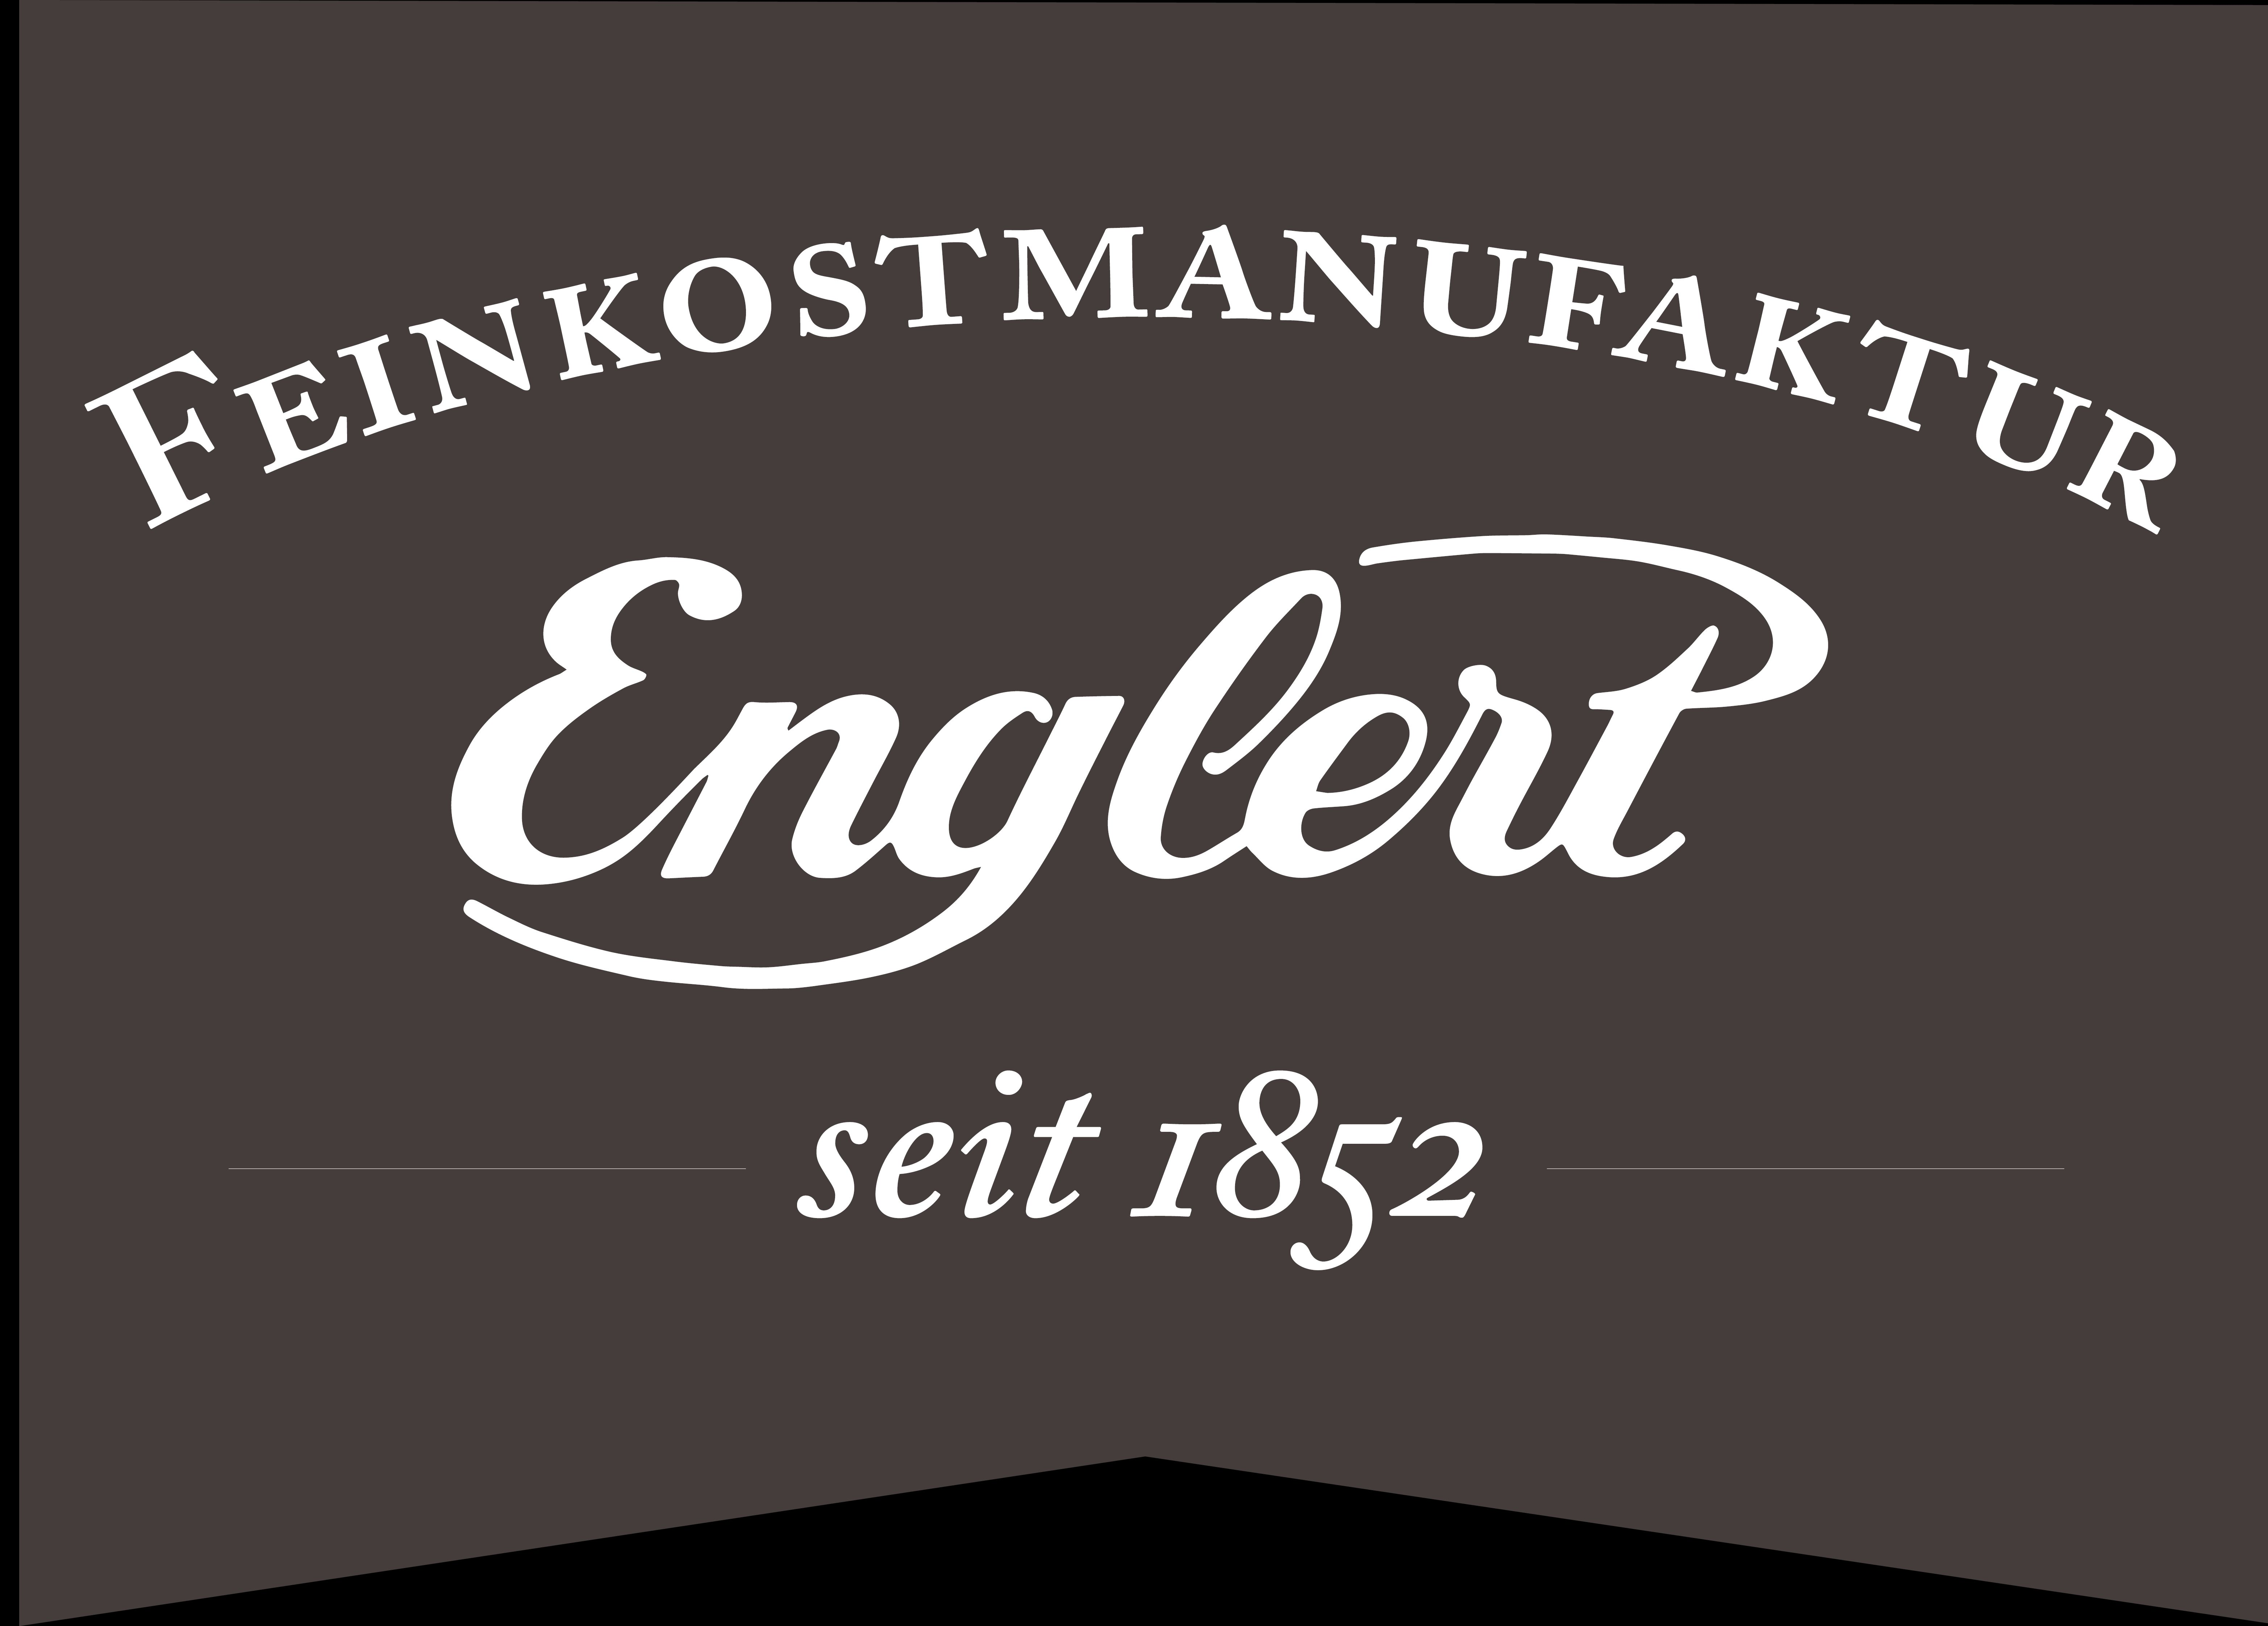 ENGLERT Feinkostspezialitäten GmbH & Co. KG